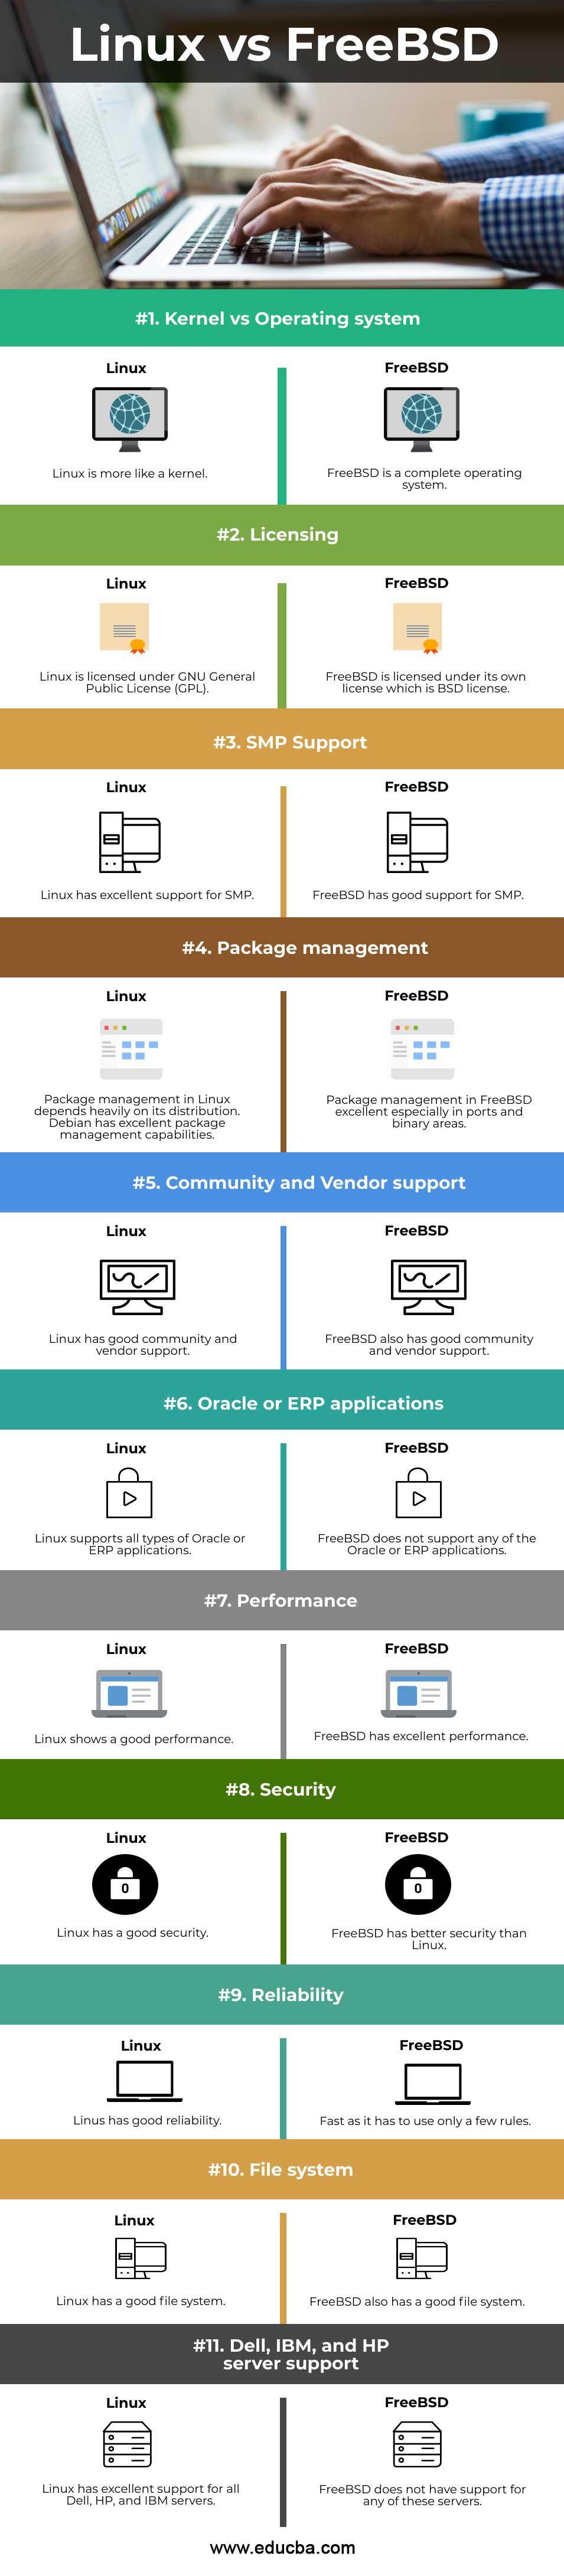 Linux-vs-FreeBSD-info